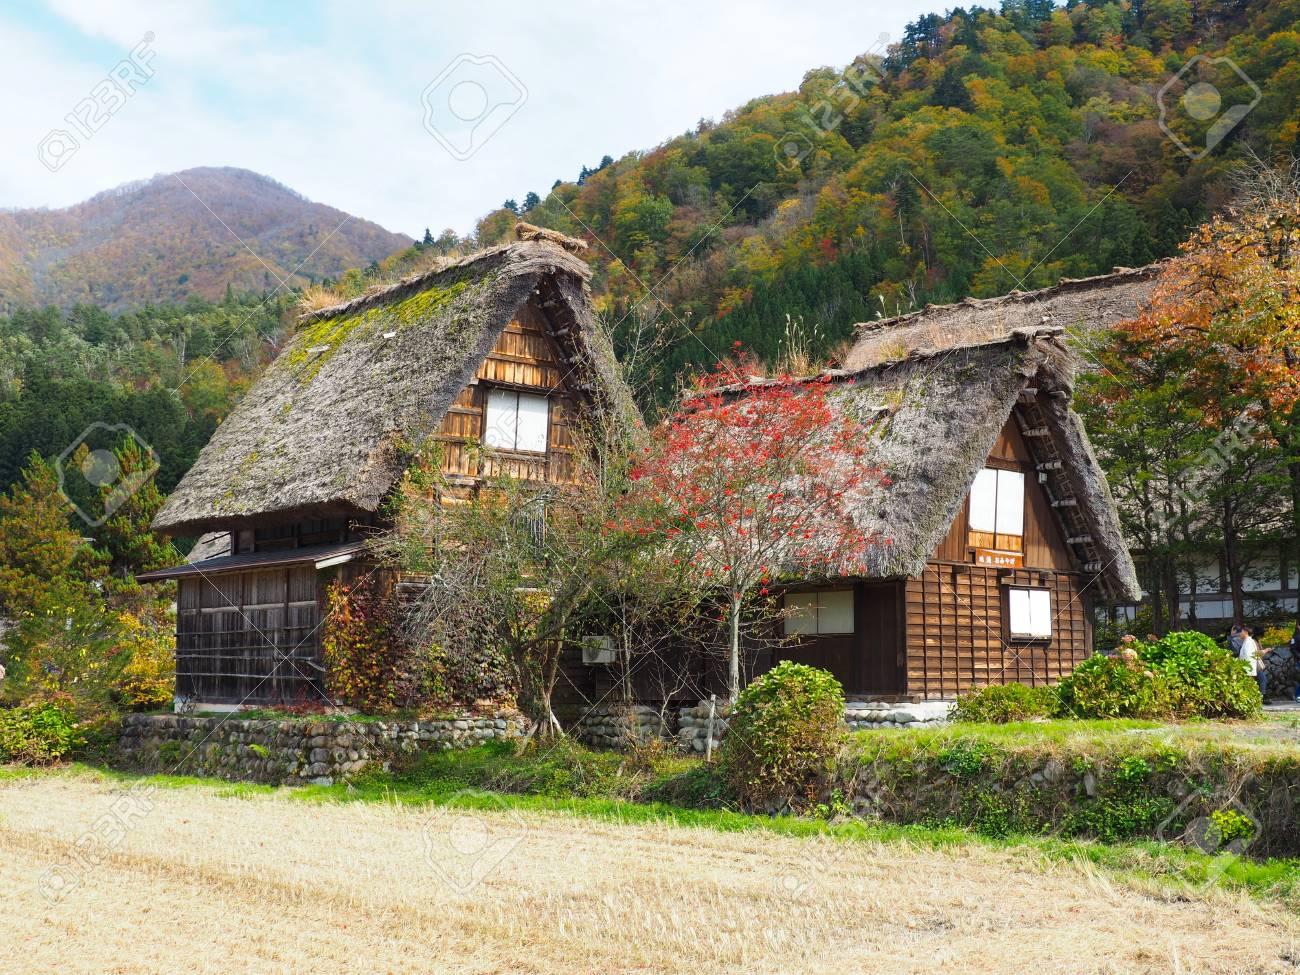 Shirakawa Go, Japan, 2015. Einer Der Vielen Häuser In Shiragawa Go ...